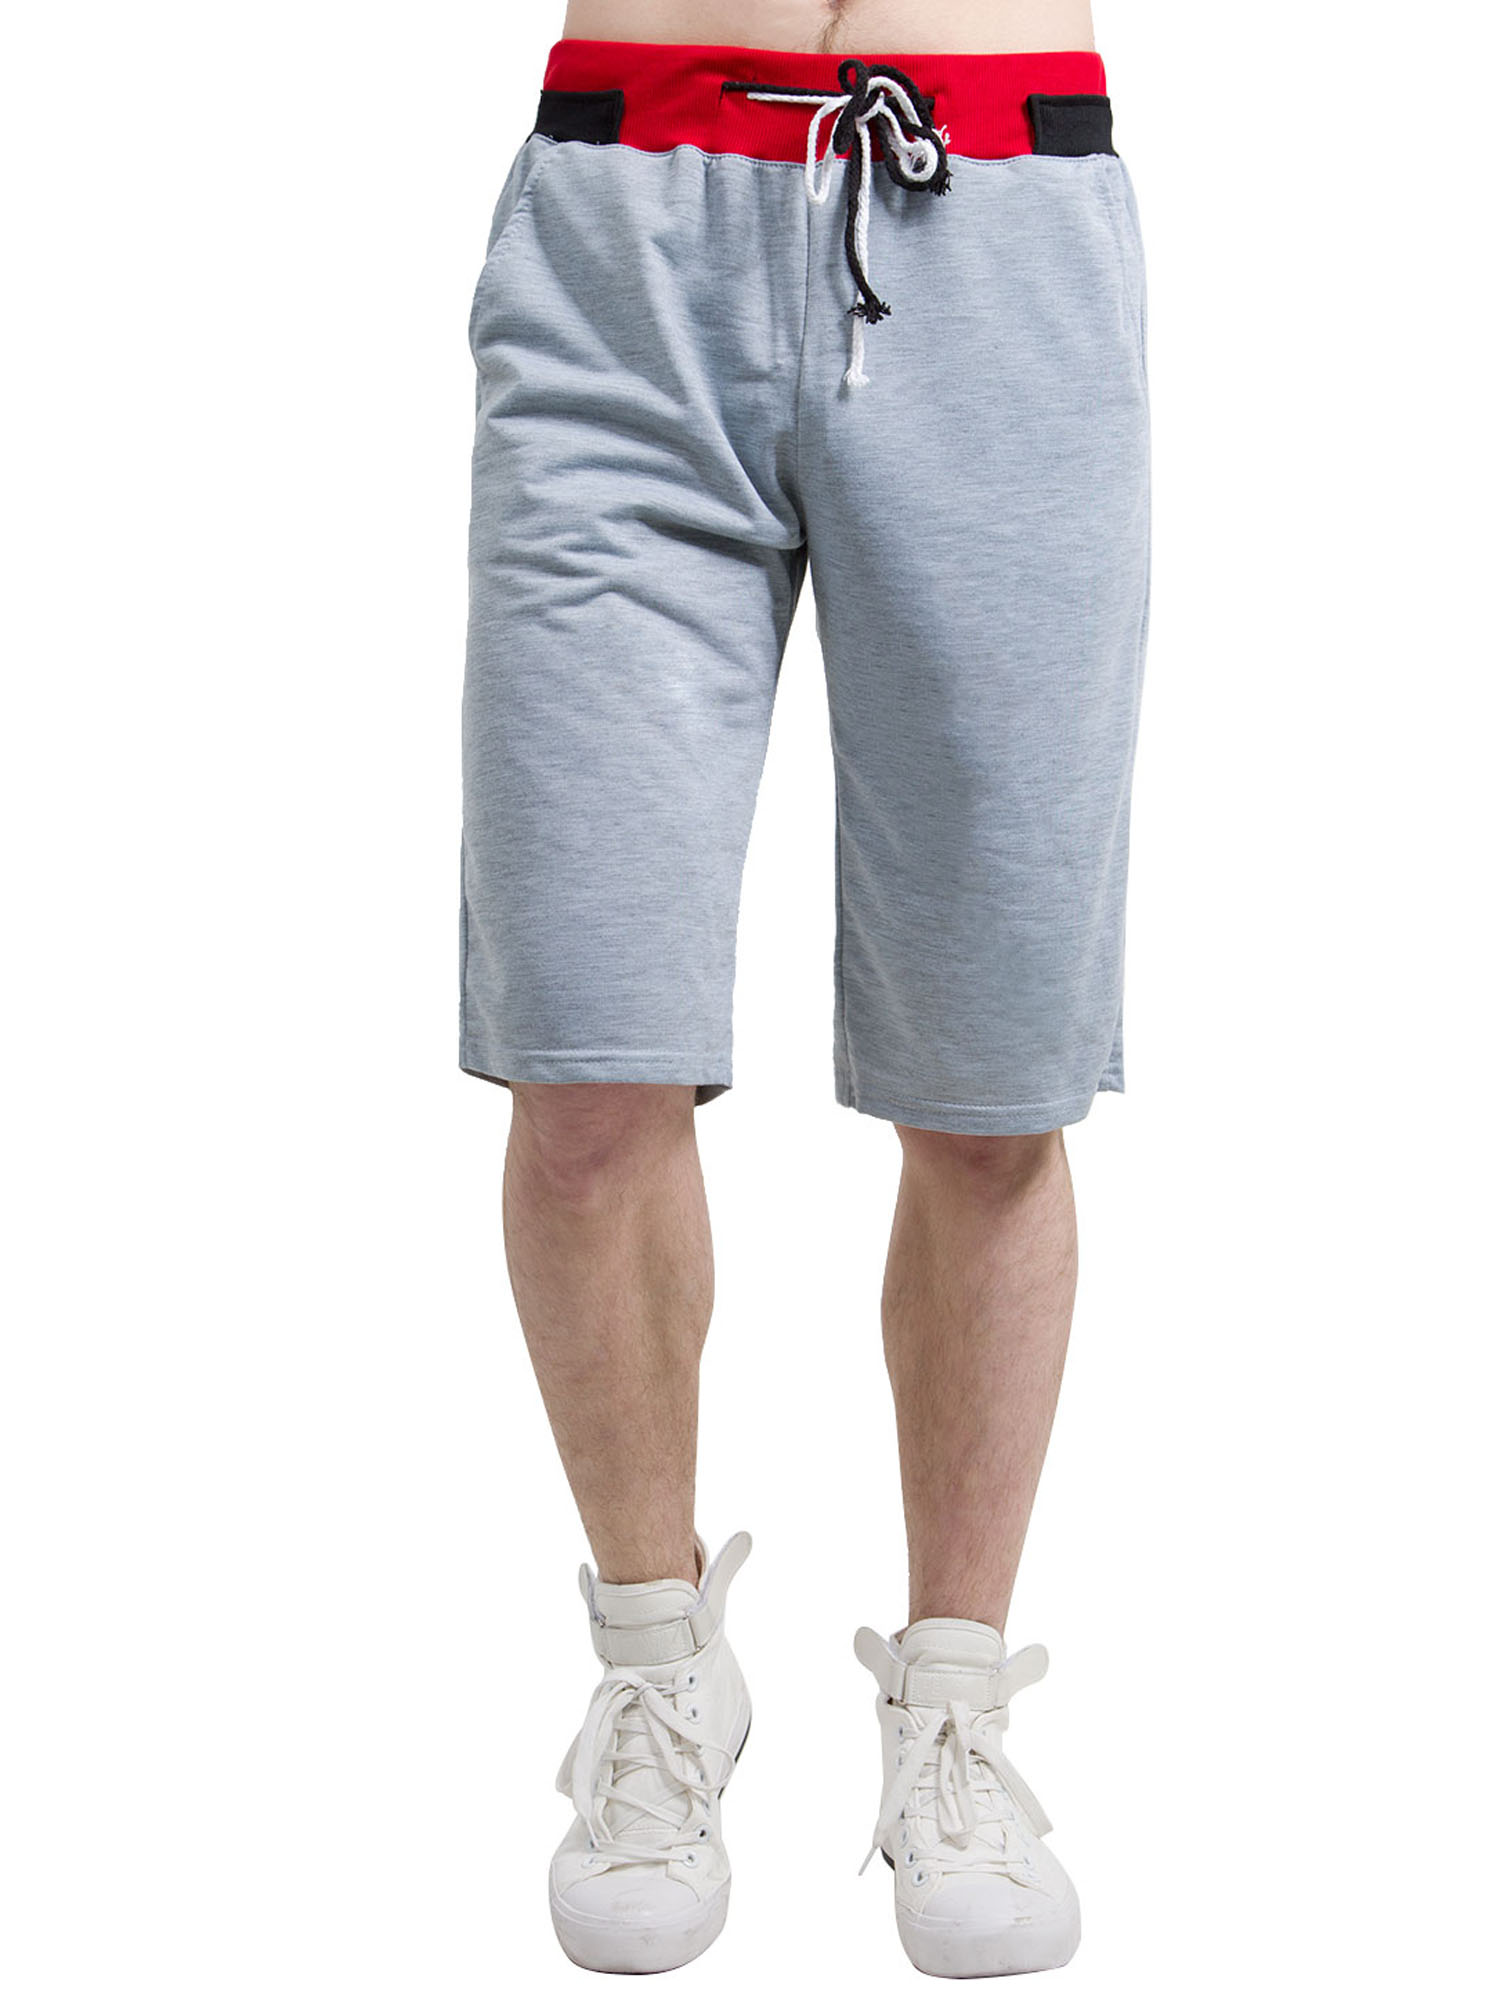 TBVS 79 Straight Outta Los Angeles Mens Elastic Waist Beach Board Shorts with Pocket Drawstring